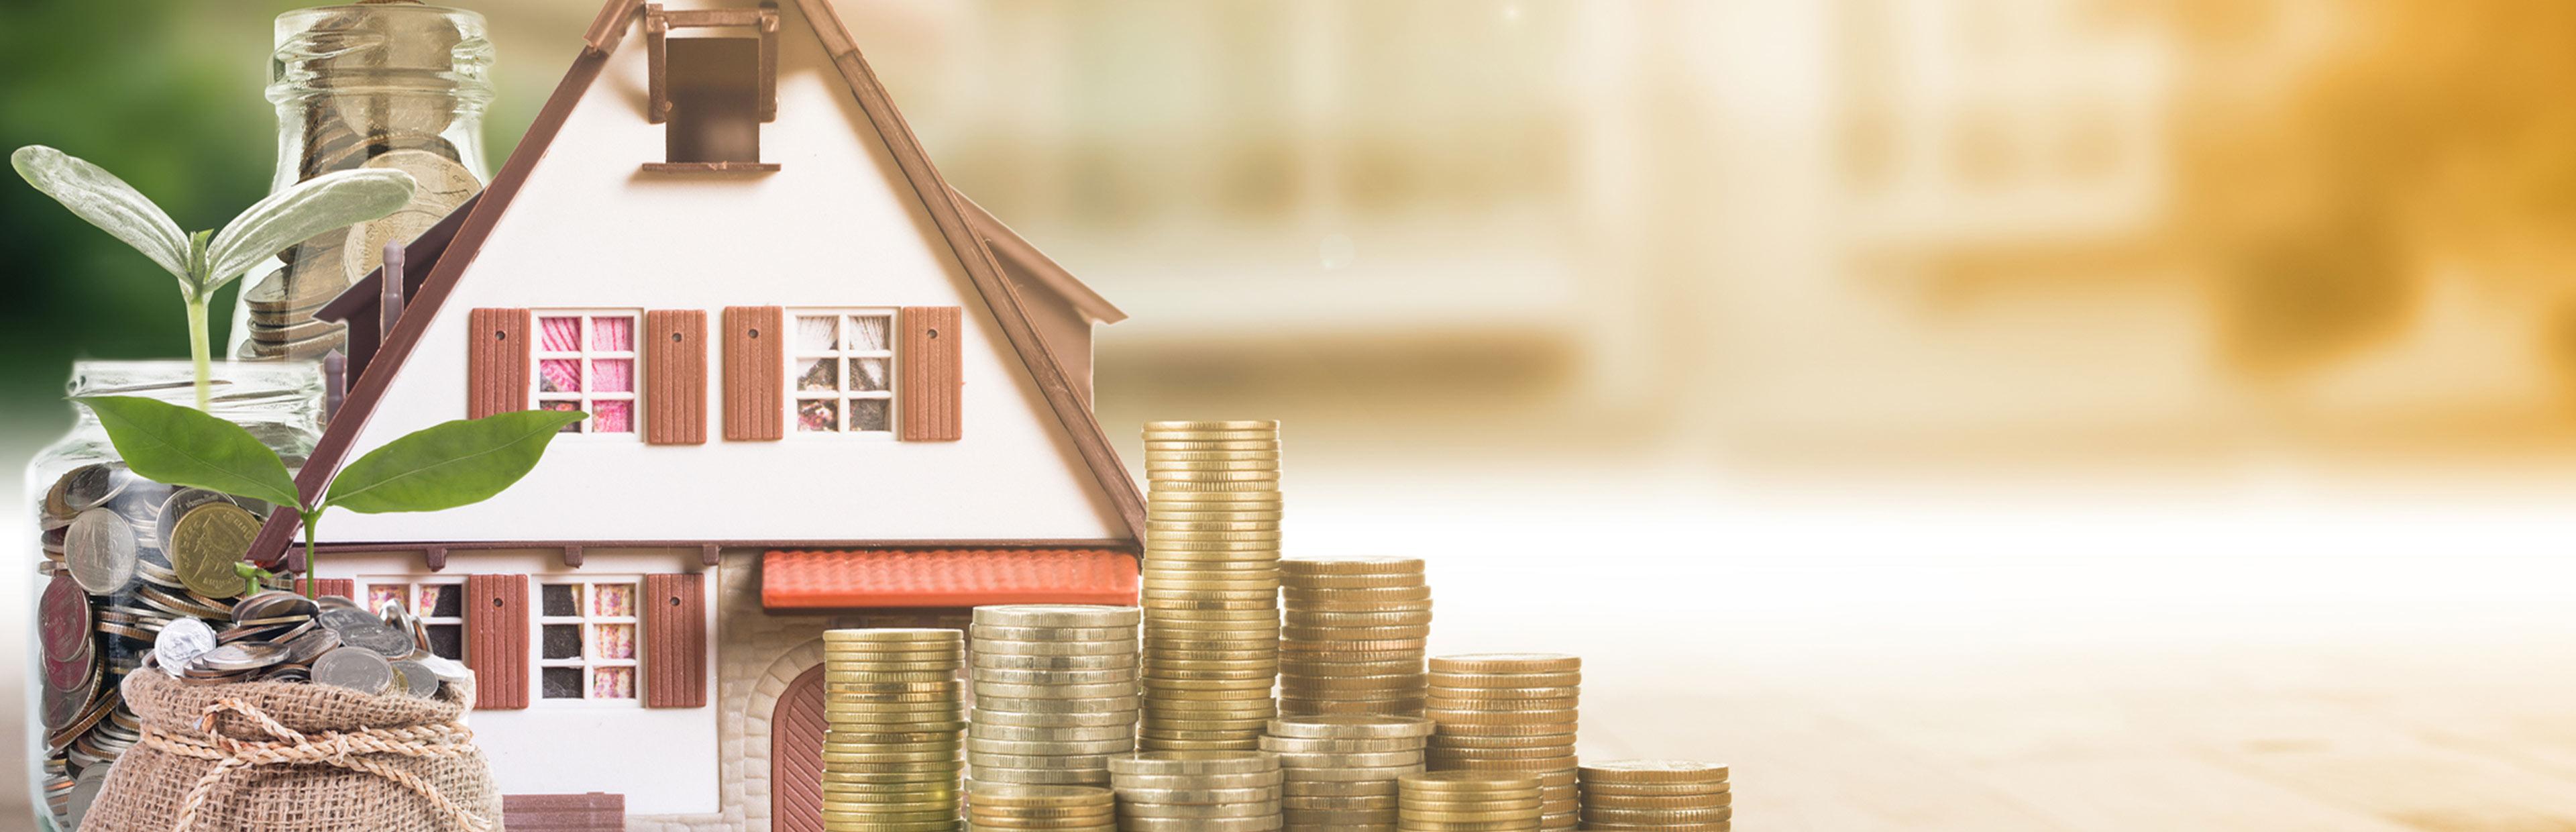 National Savings Bank Vehicle Loan